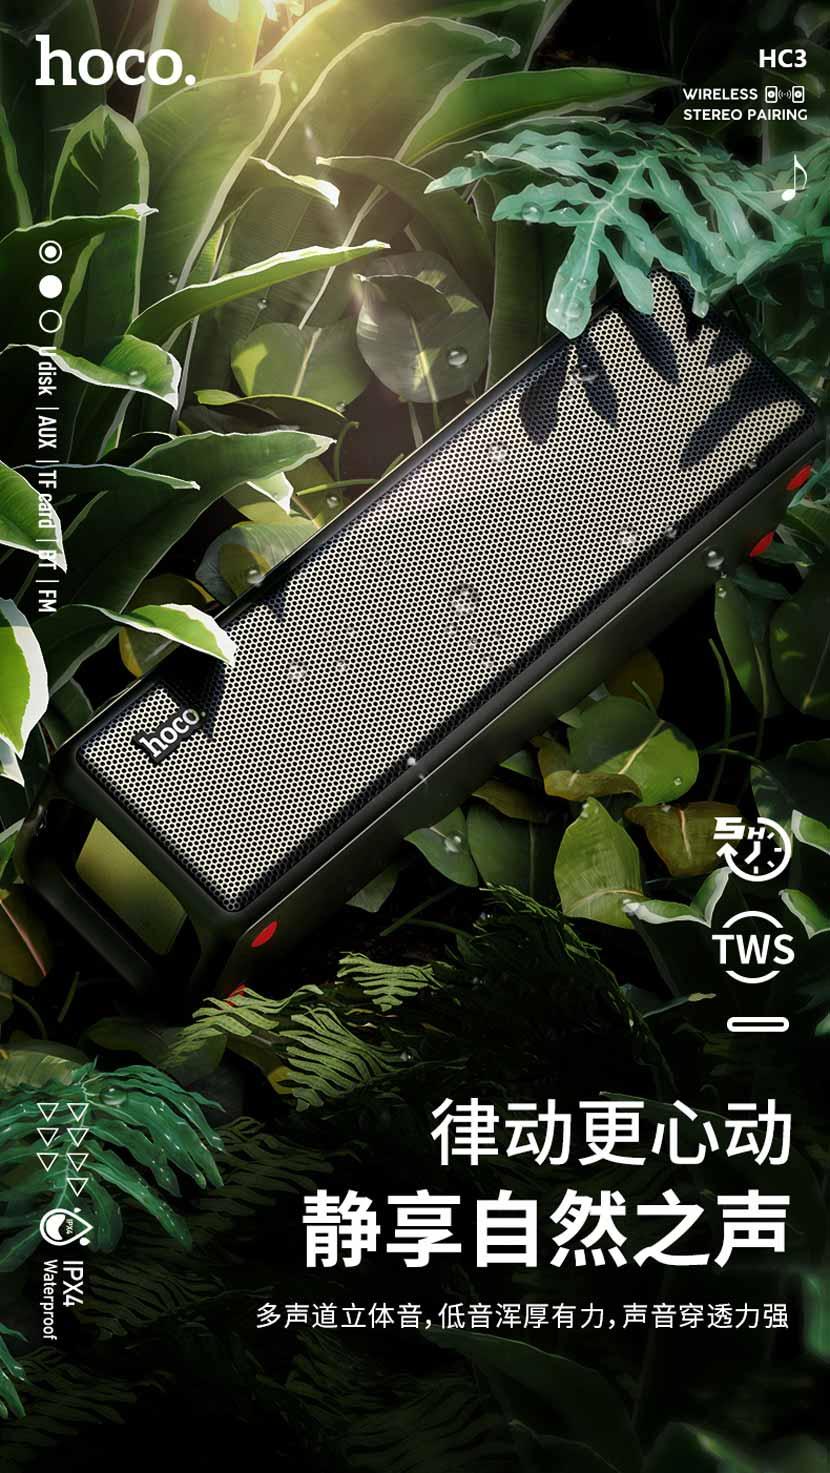 hoco news hc3 bounce sports wireless speaker cn